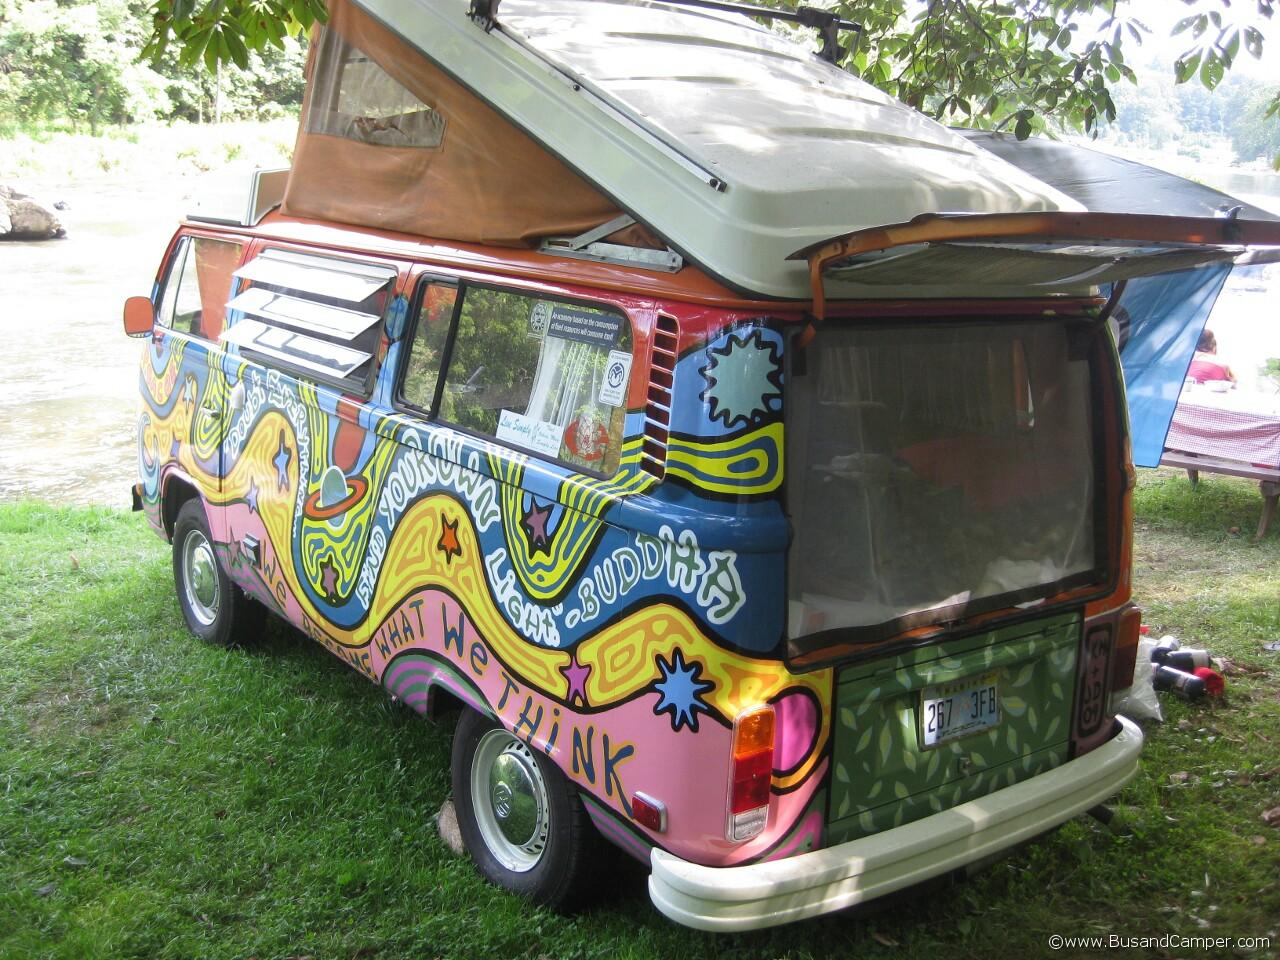 Buddha Bus Hippy paint Volkswagen 24